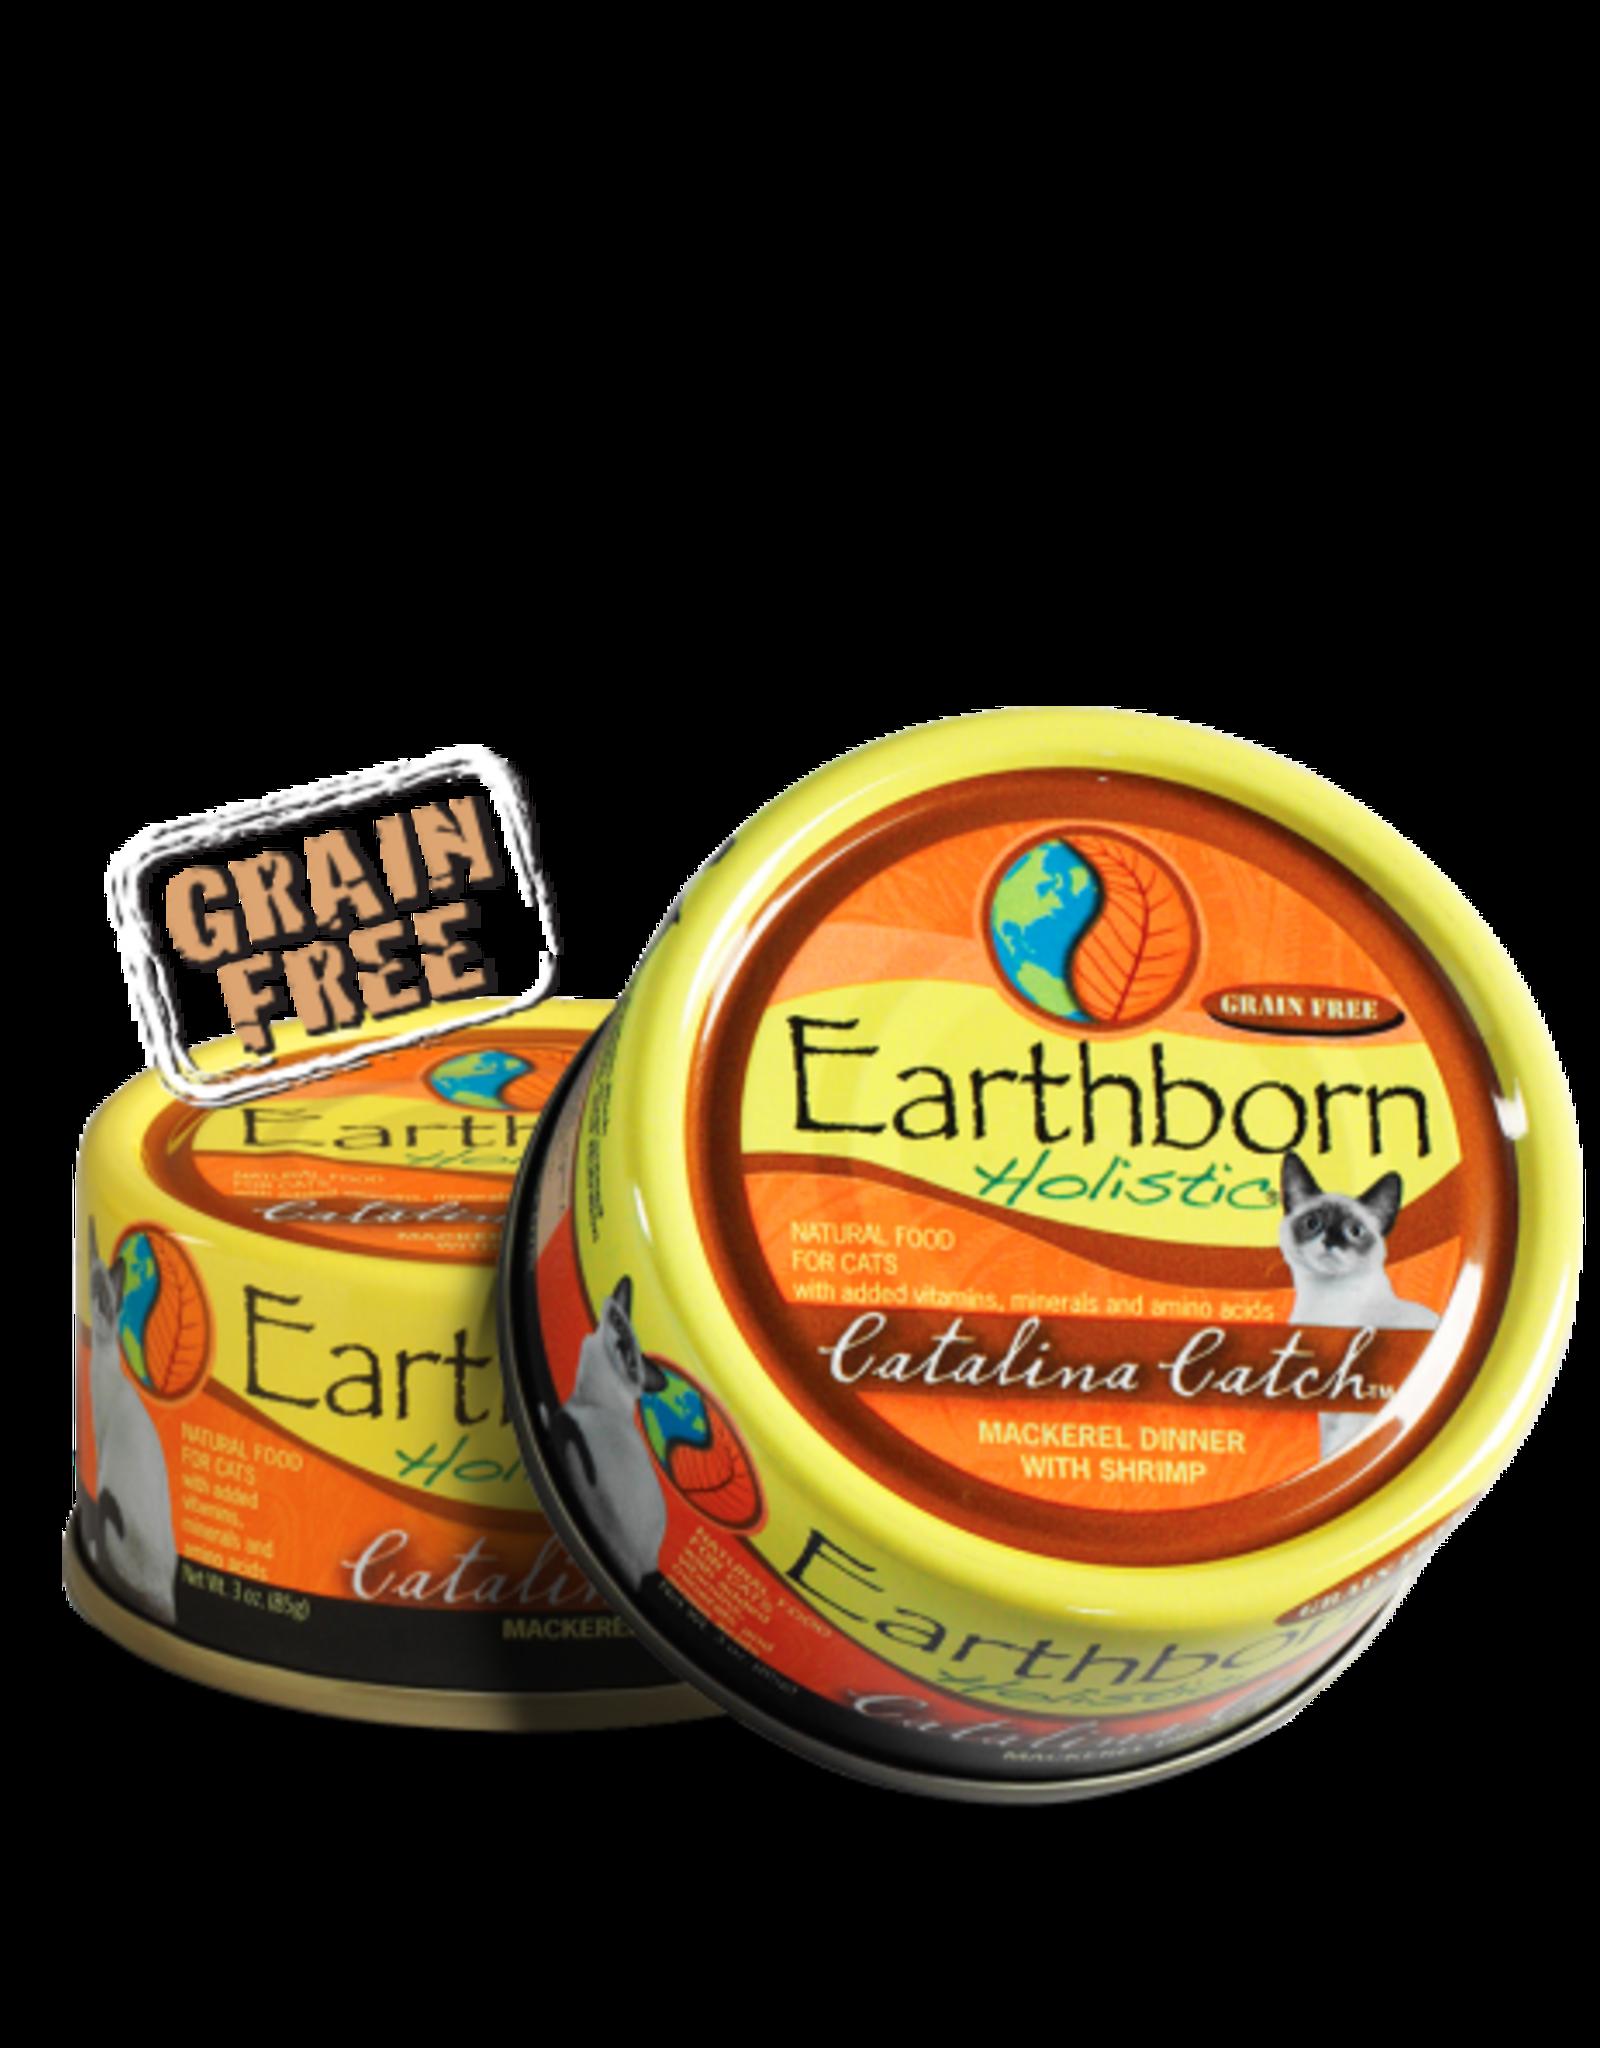 EARTHBORN EARTHBORN HOLISTIC CATALINA CATCH MACKEREL & SHRIMP 3OZ CASE OF 24